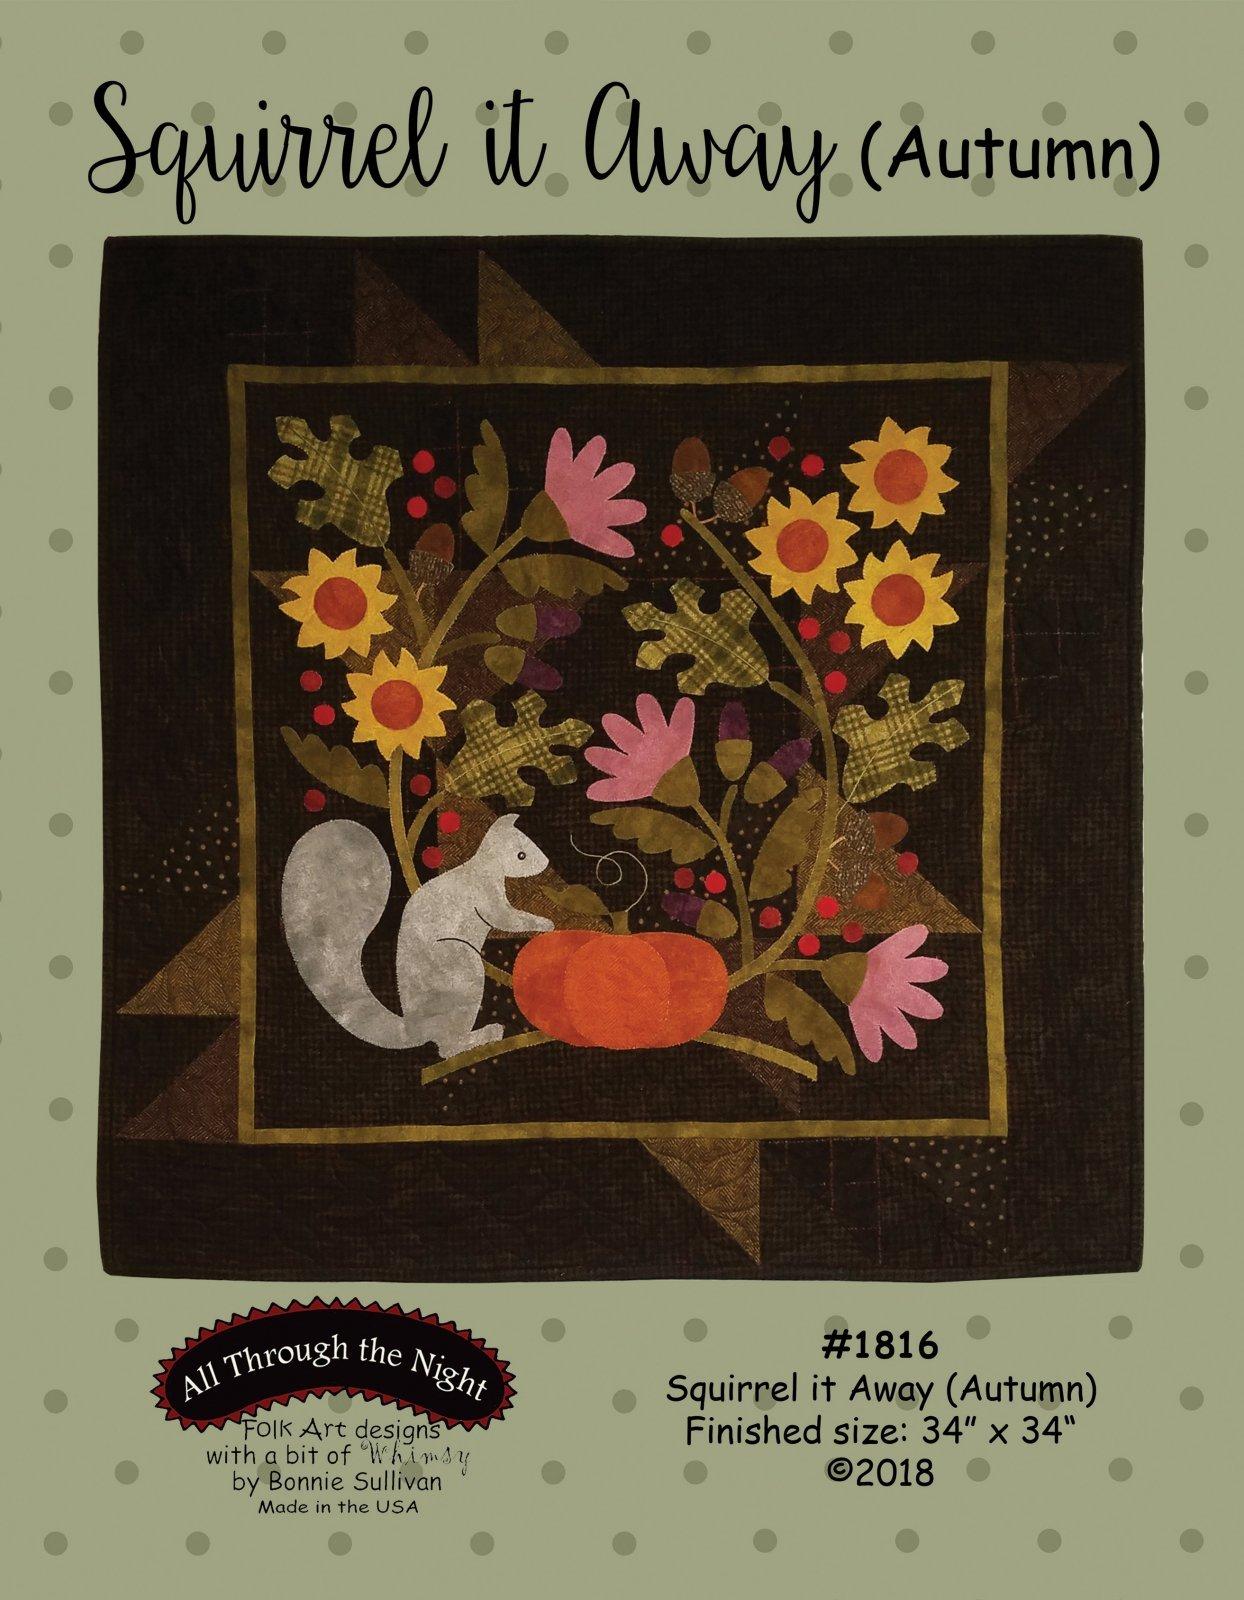 Squirrel It Away (Autumn) Kit